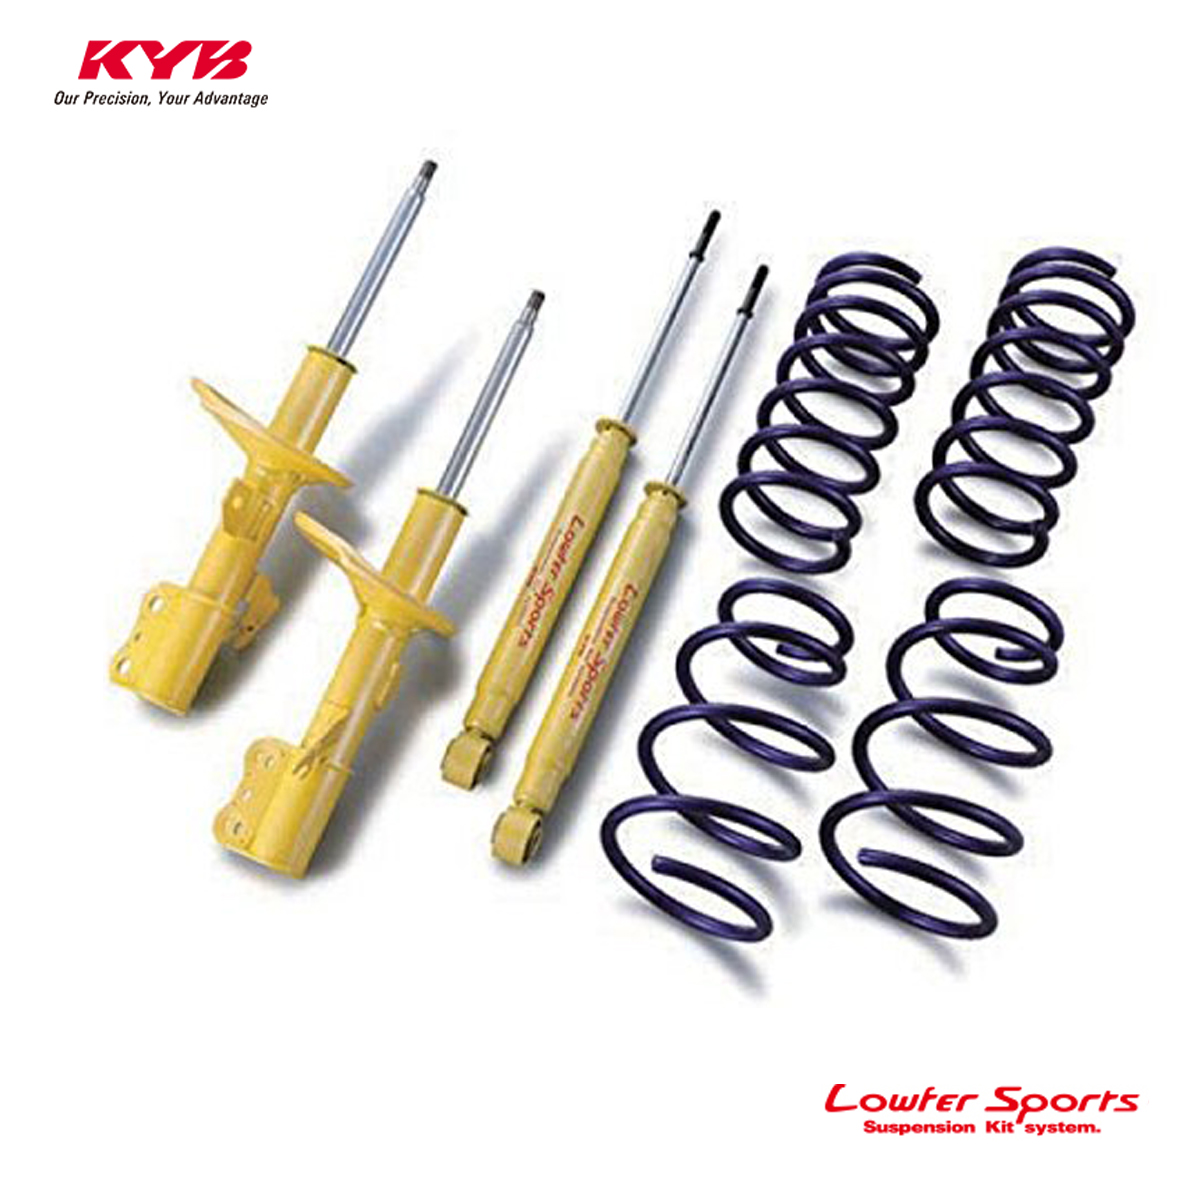 KYB カヤバ ノア ZRR85G ショックアブソーバー サスペンションキット Lowfer Sports LKIT-ZRR85G 配送先条件有り